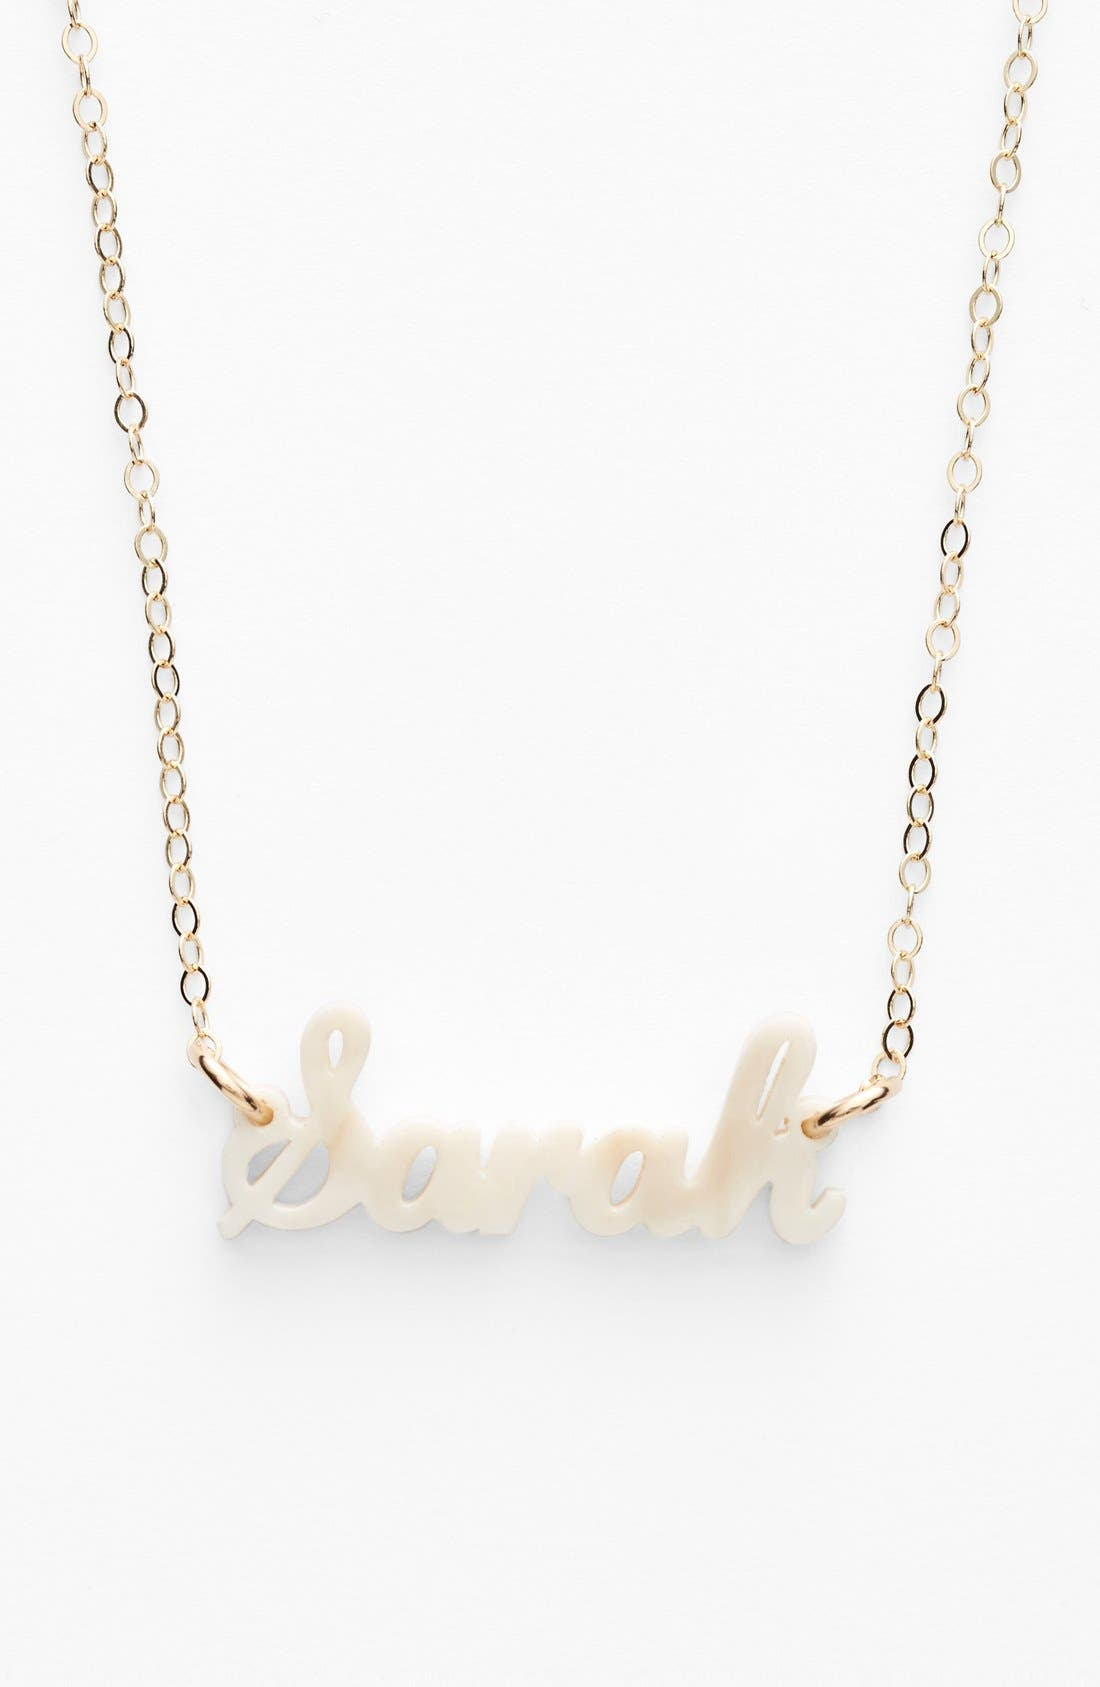 'Script Font' Personalized Nameplate Pendant Necklace,                         Main,                         color, Blonde Tortoise/ Gold